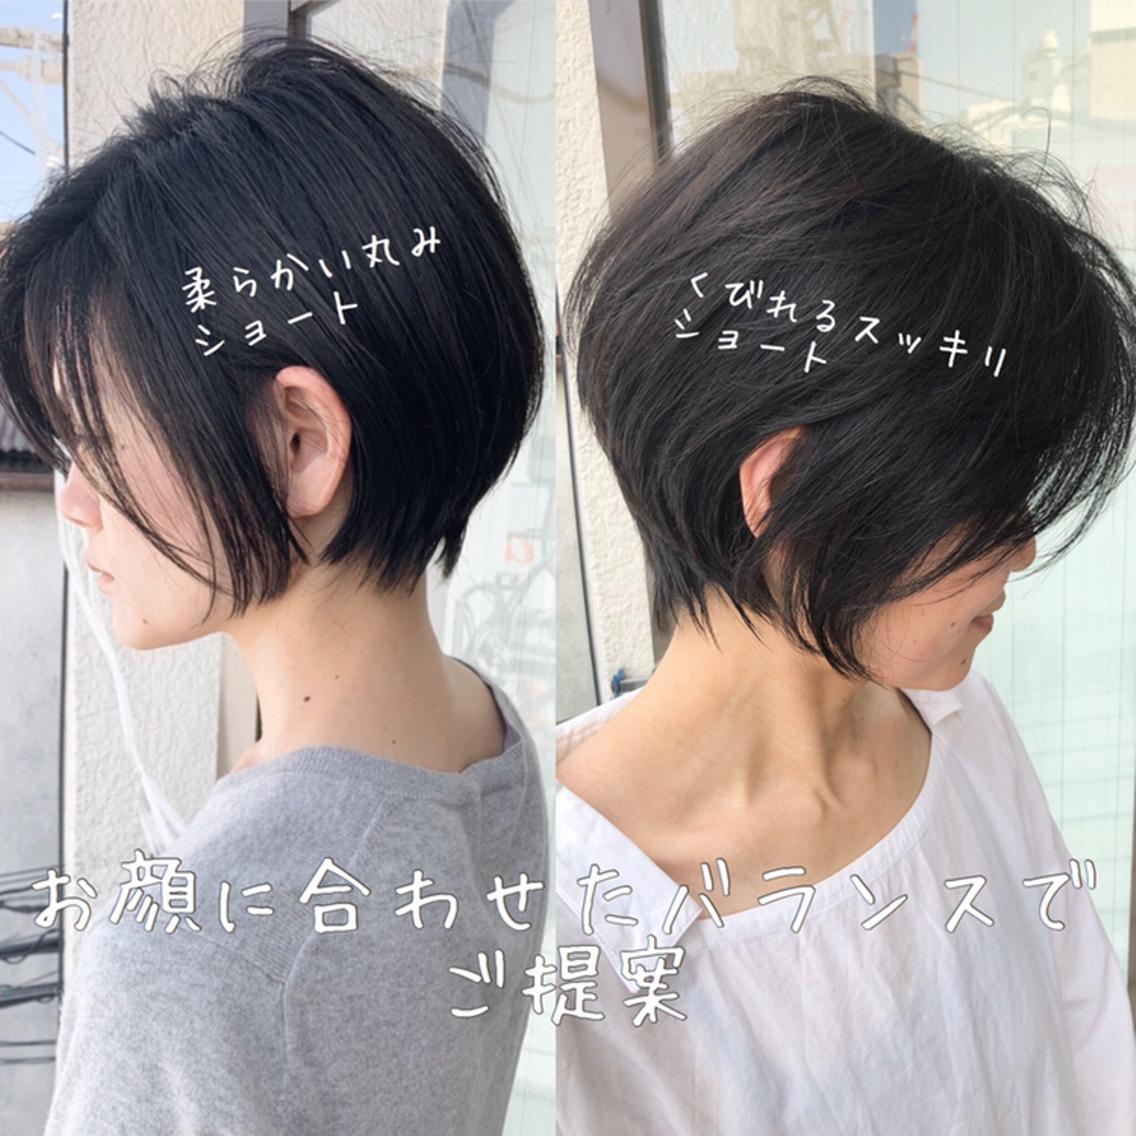 AtoZ大船所属・安齋 耕平の掲載